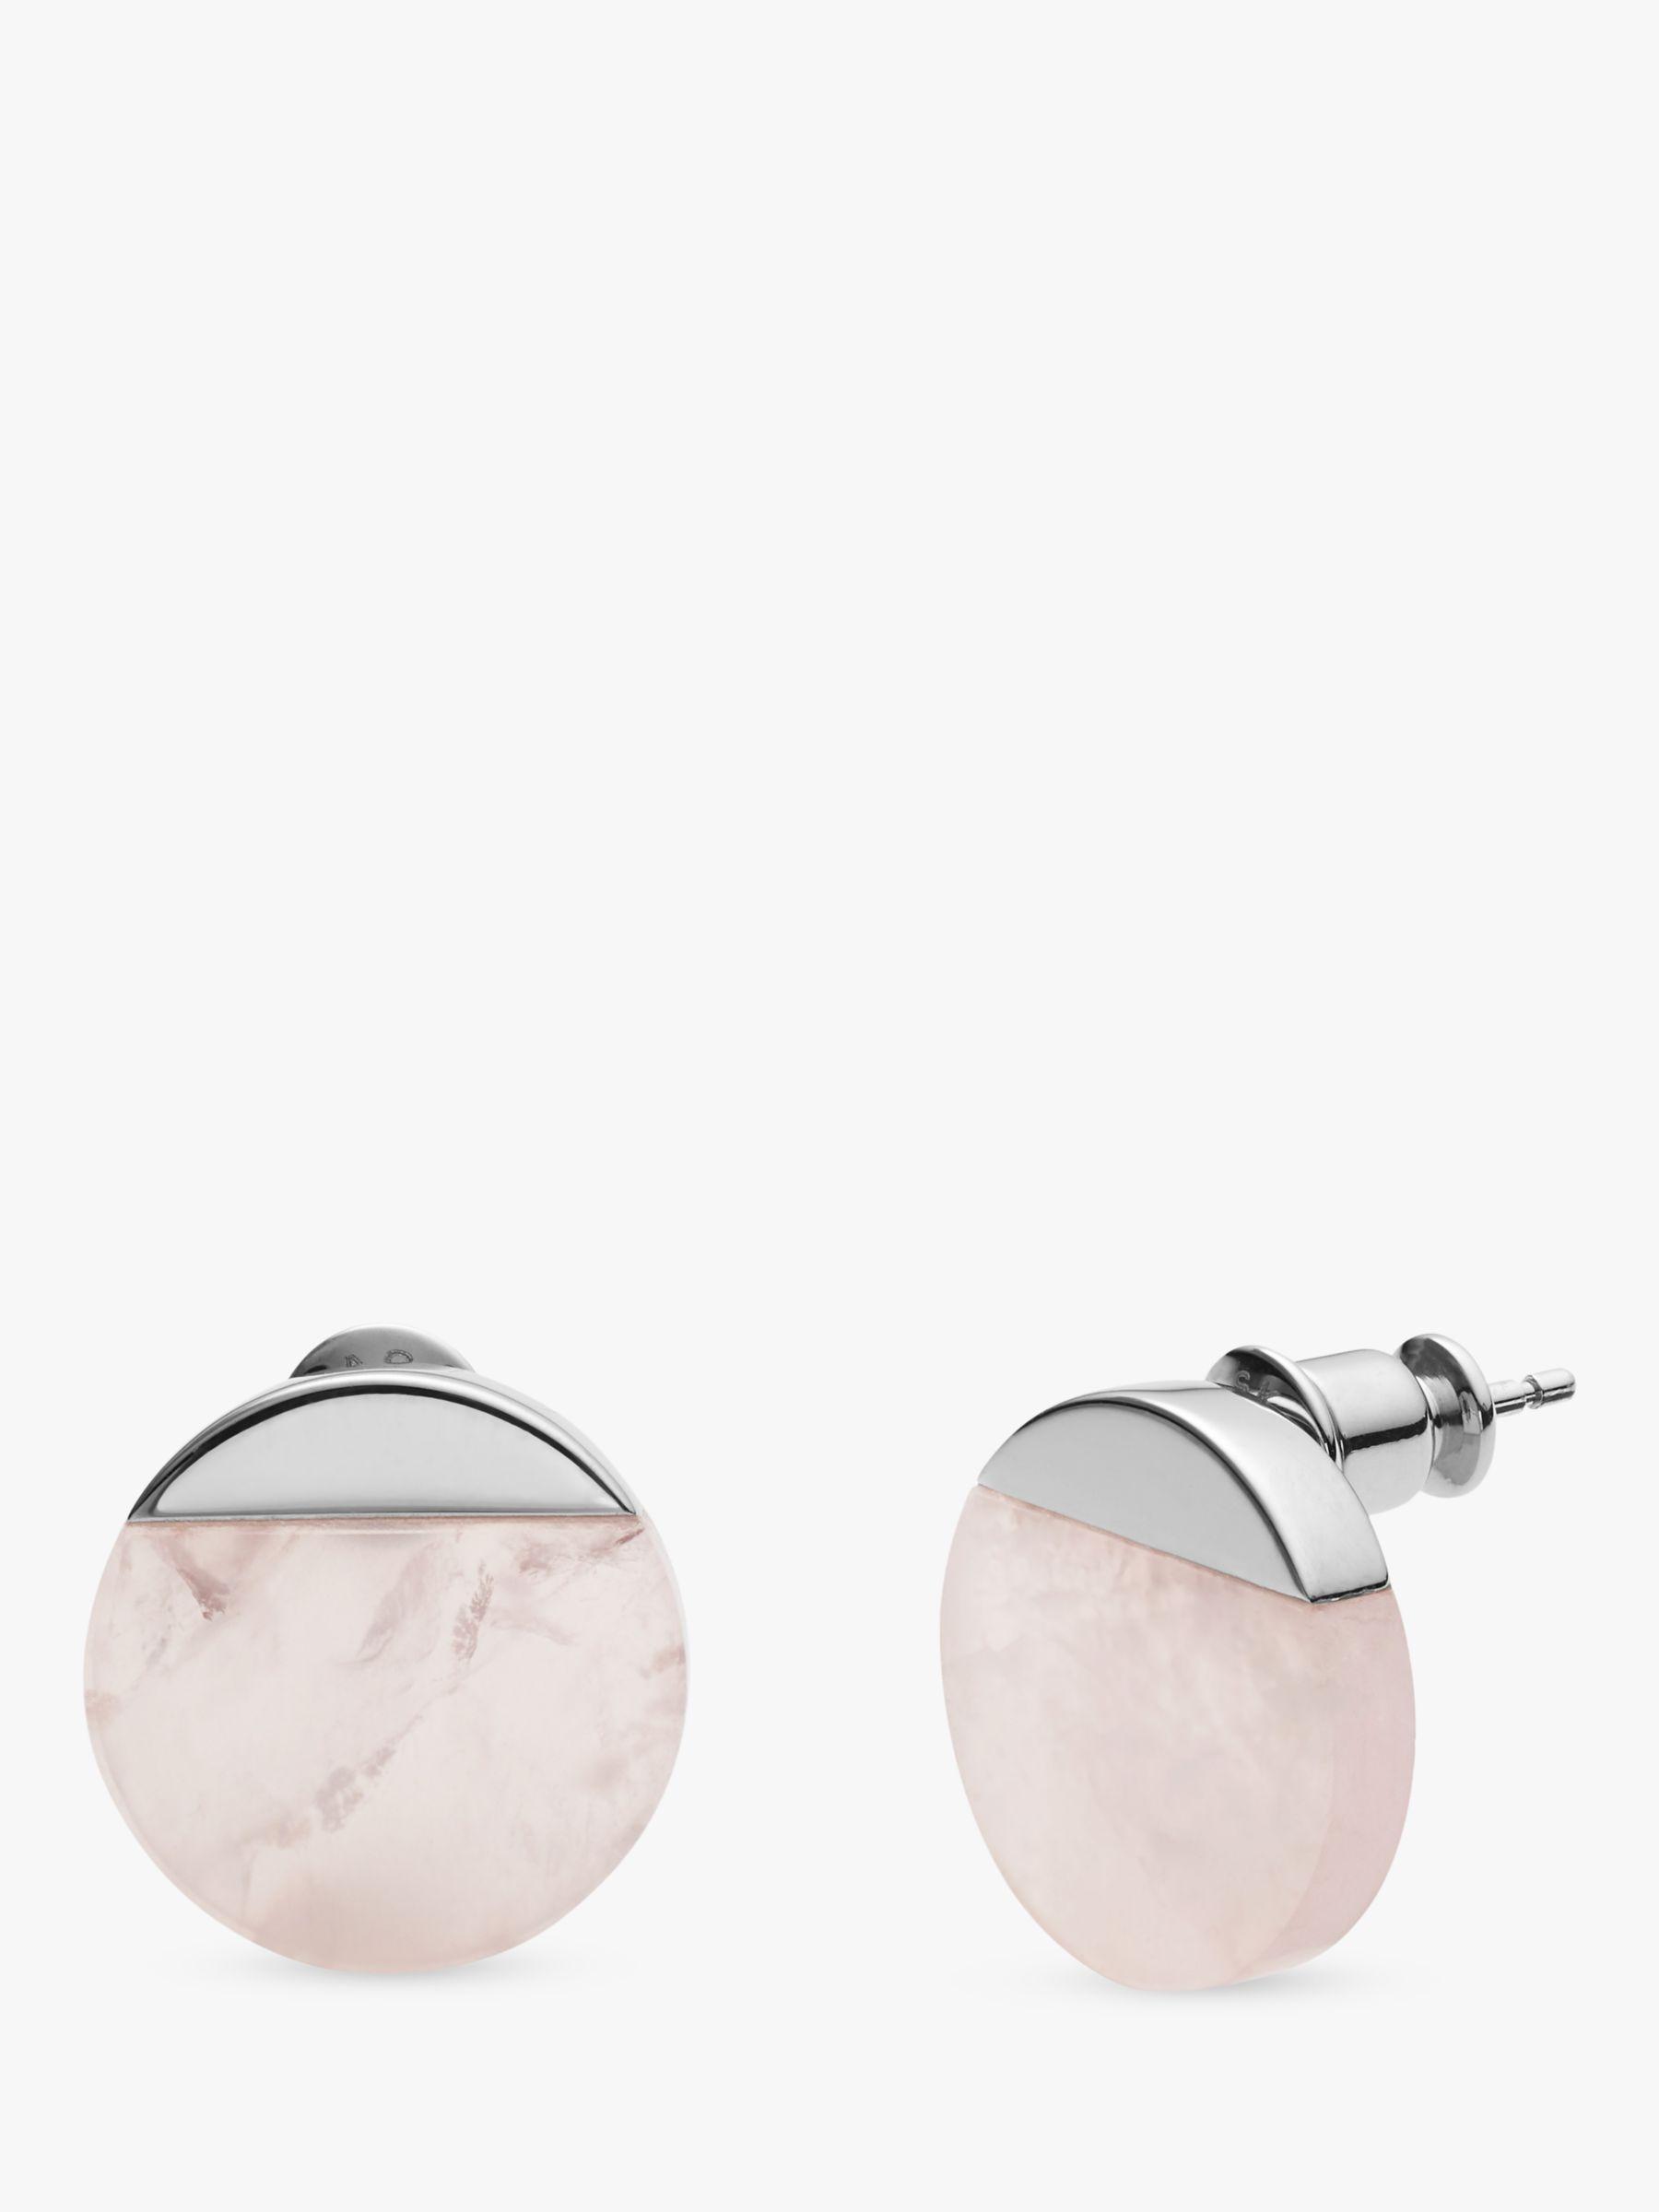 skagen Skagen Ellen Circular Rose Quartz Stud Earrings, Silver SKJ1184040